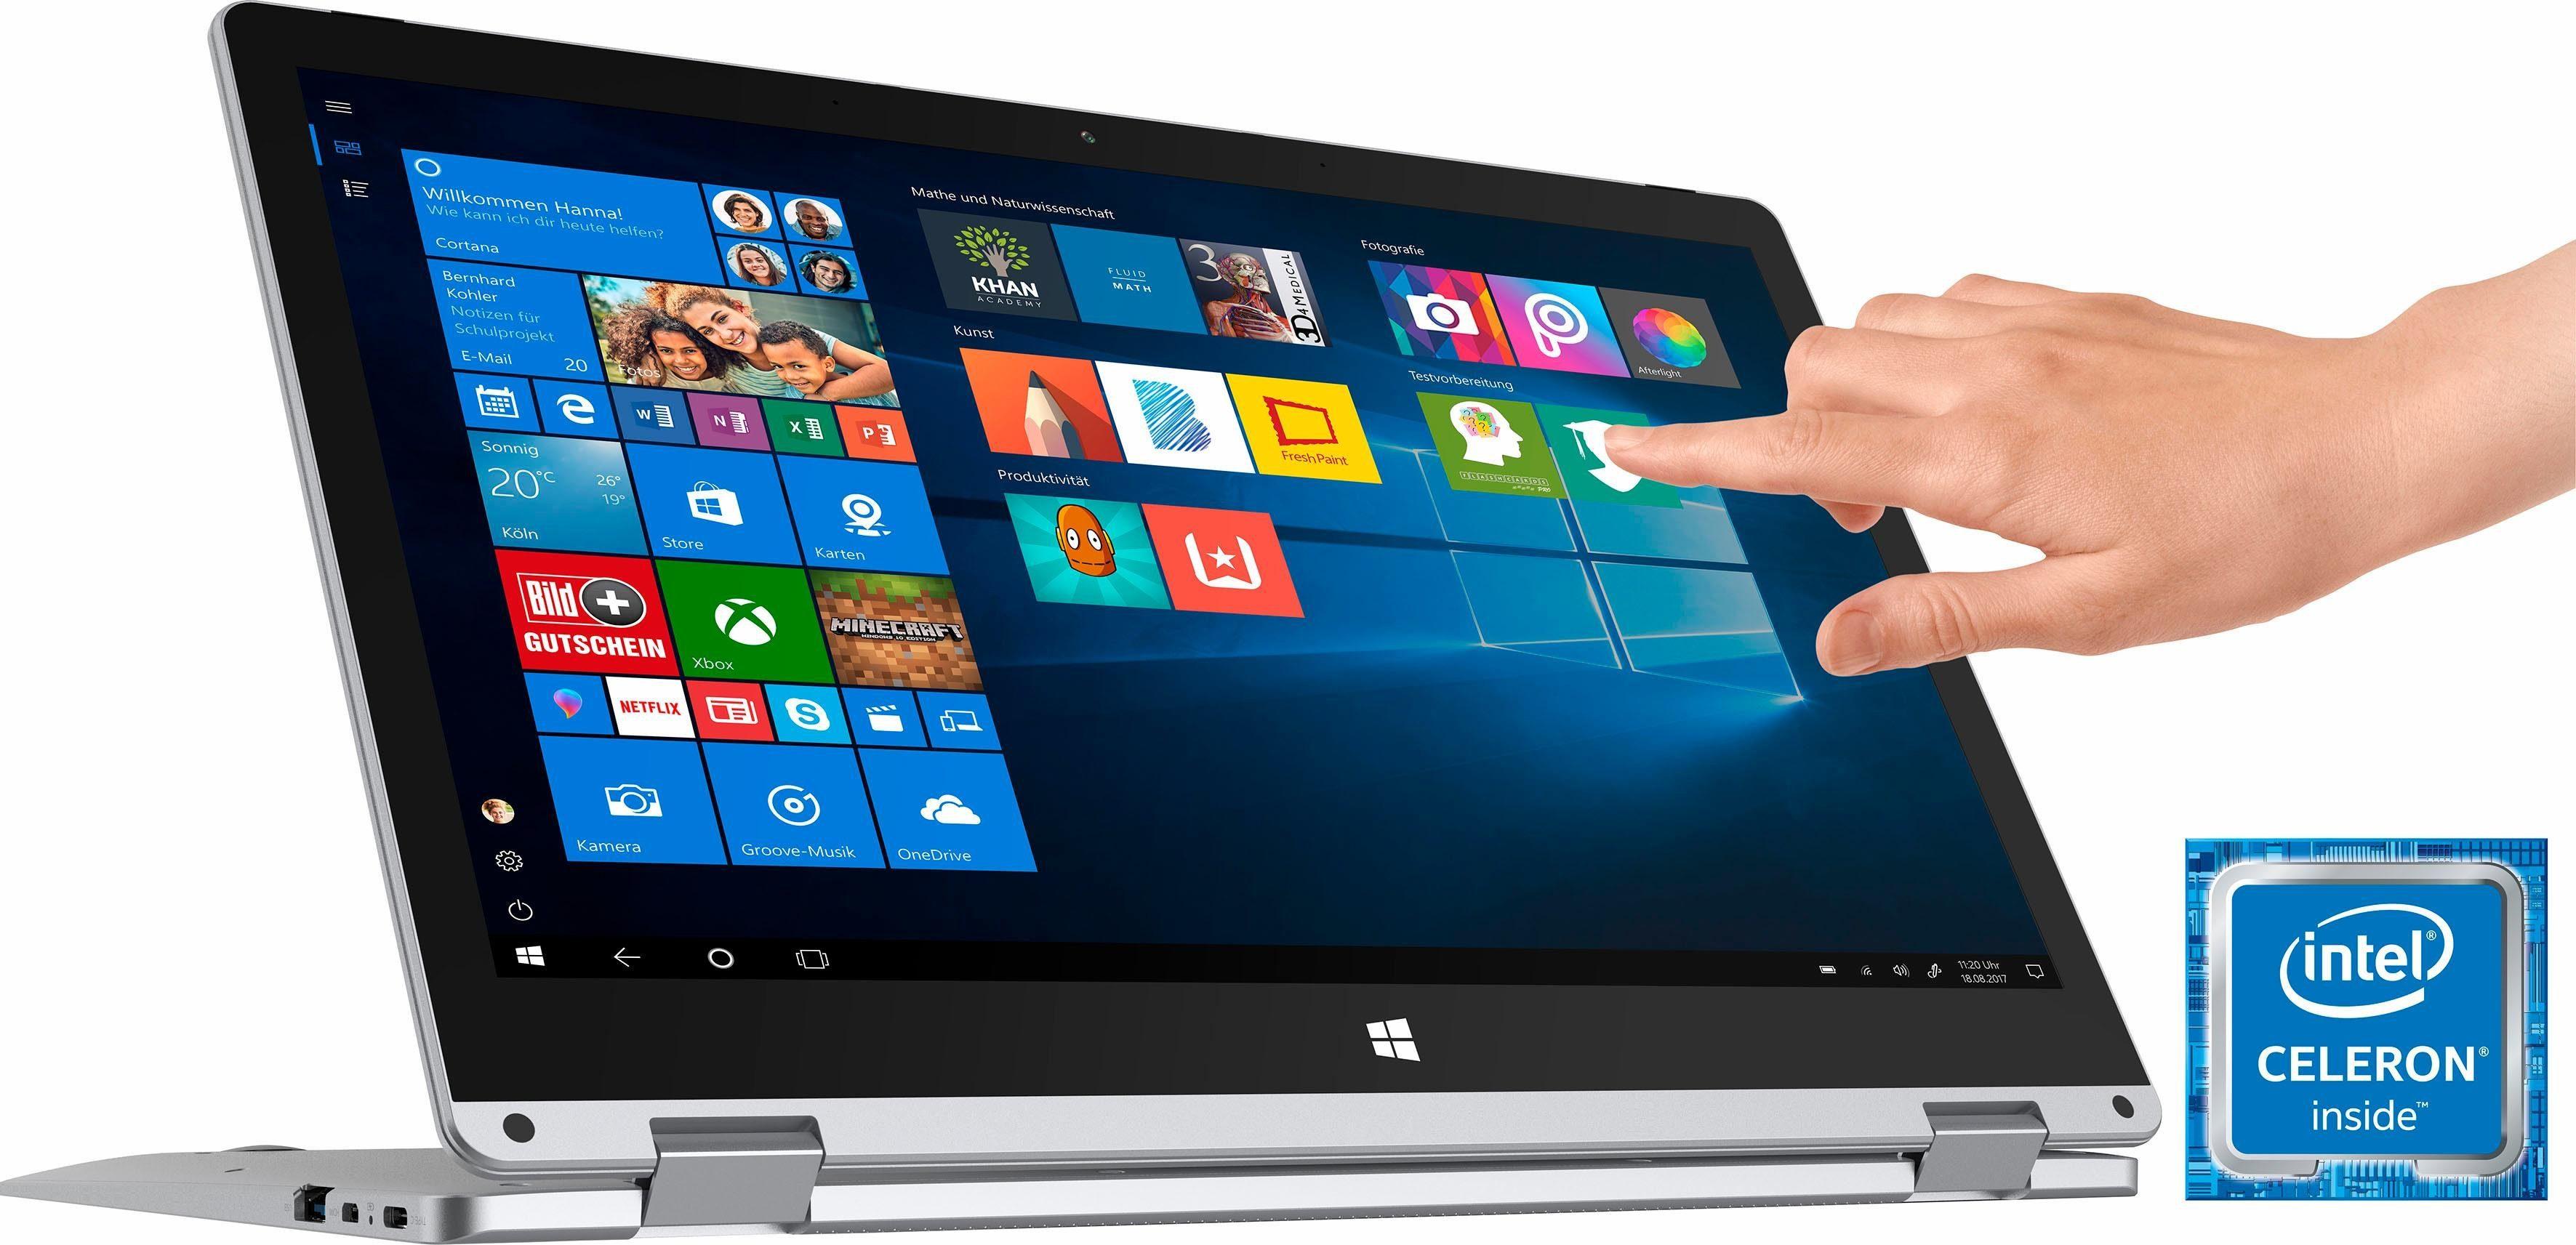 TREKSTOR Volks-Notebook PRIMEBOOK C13, WiFi , Intel® Celeron® N3350 Prozessor, 33,8 cm (13,3 Zoll), 64 GB interner Speicher